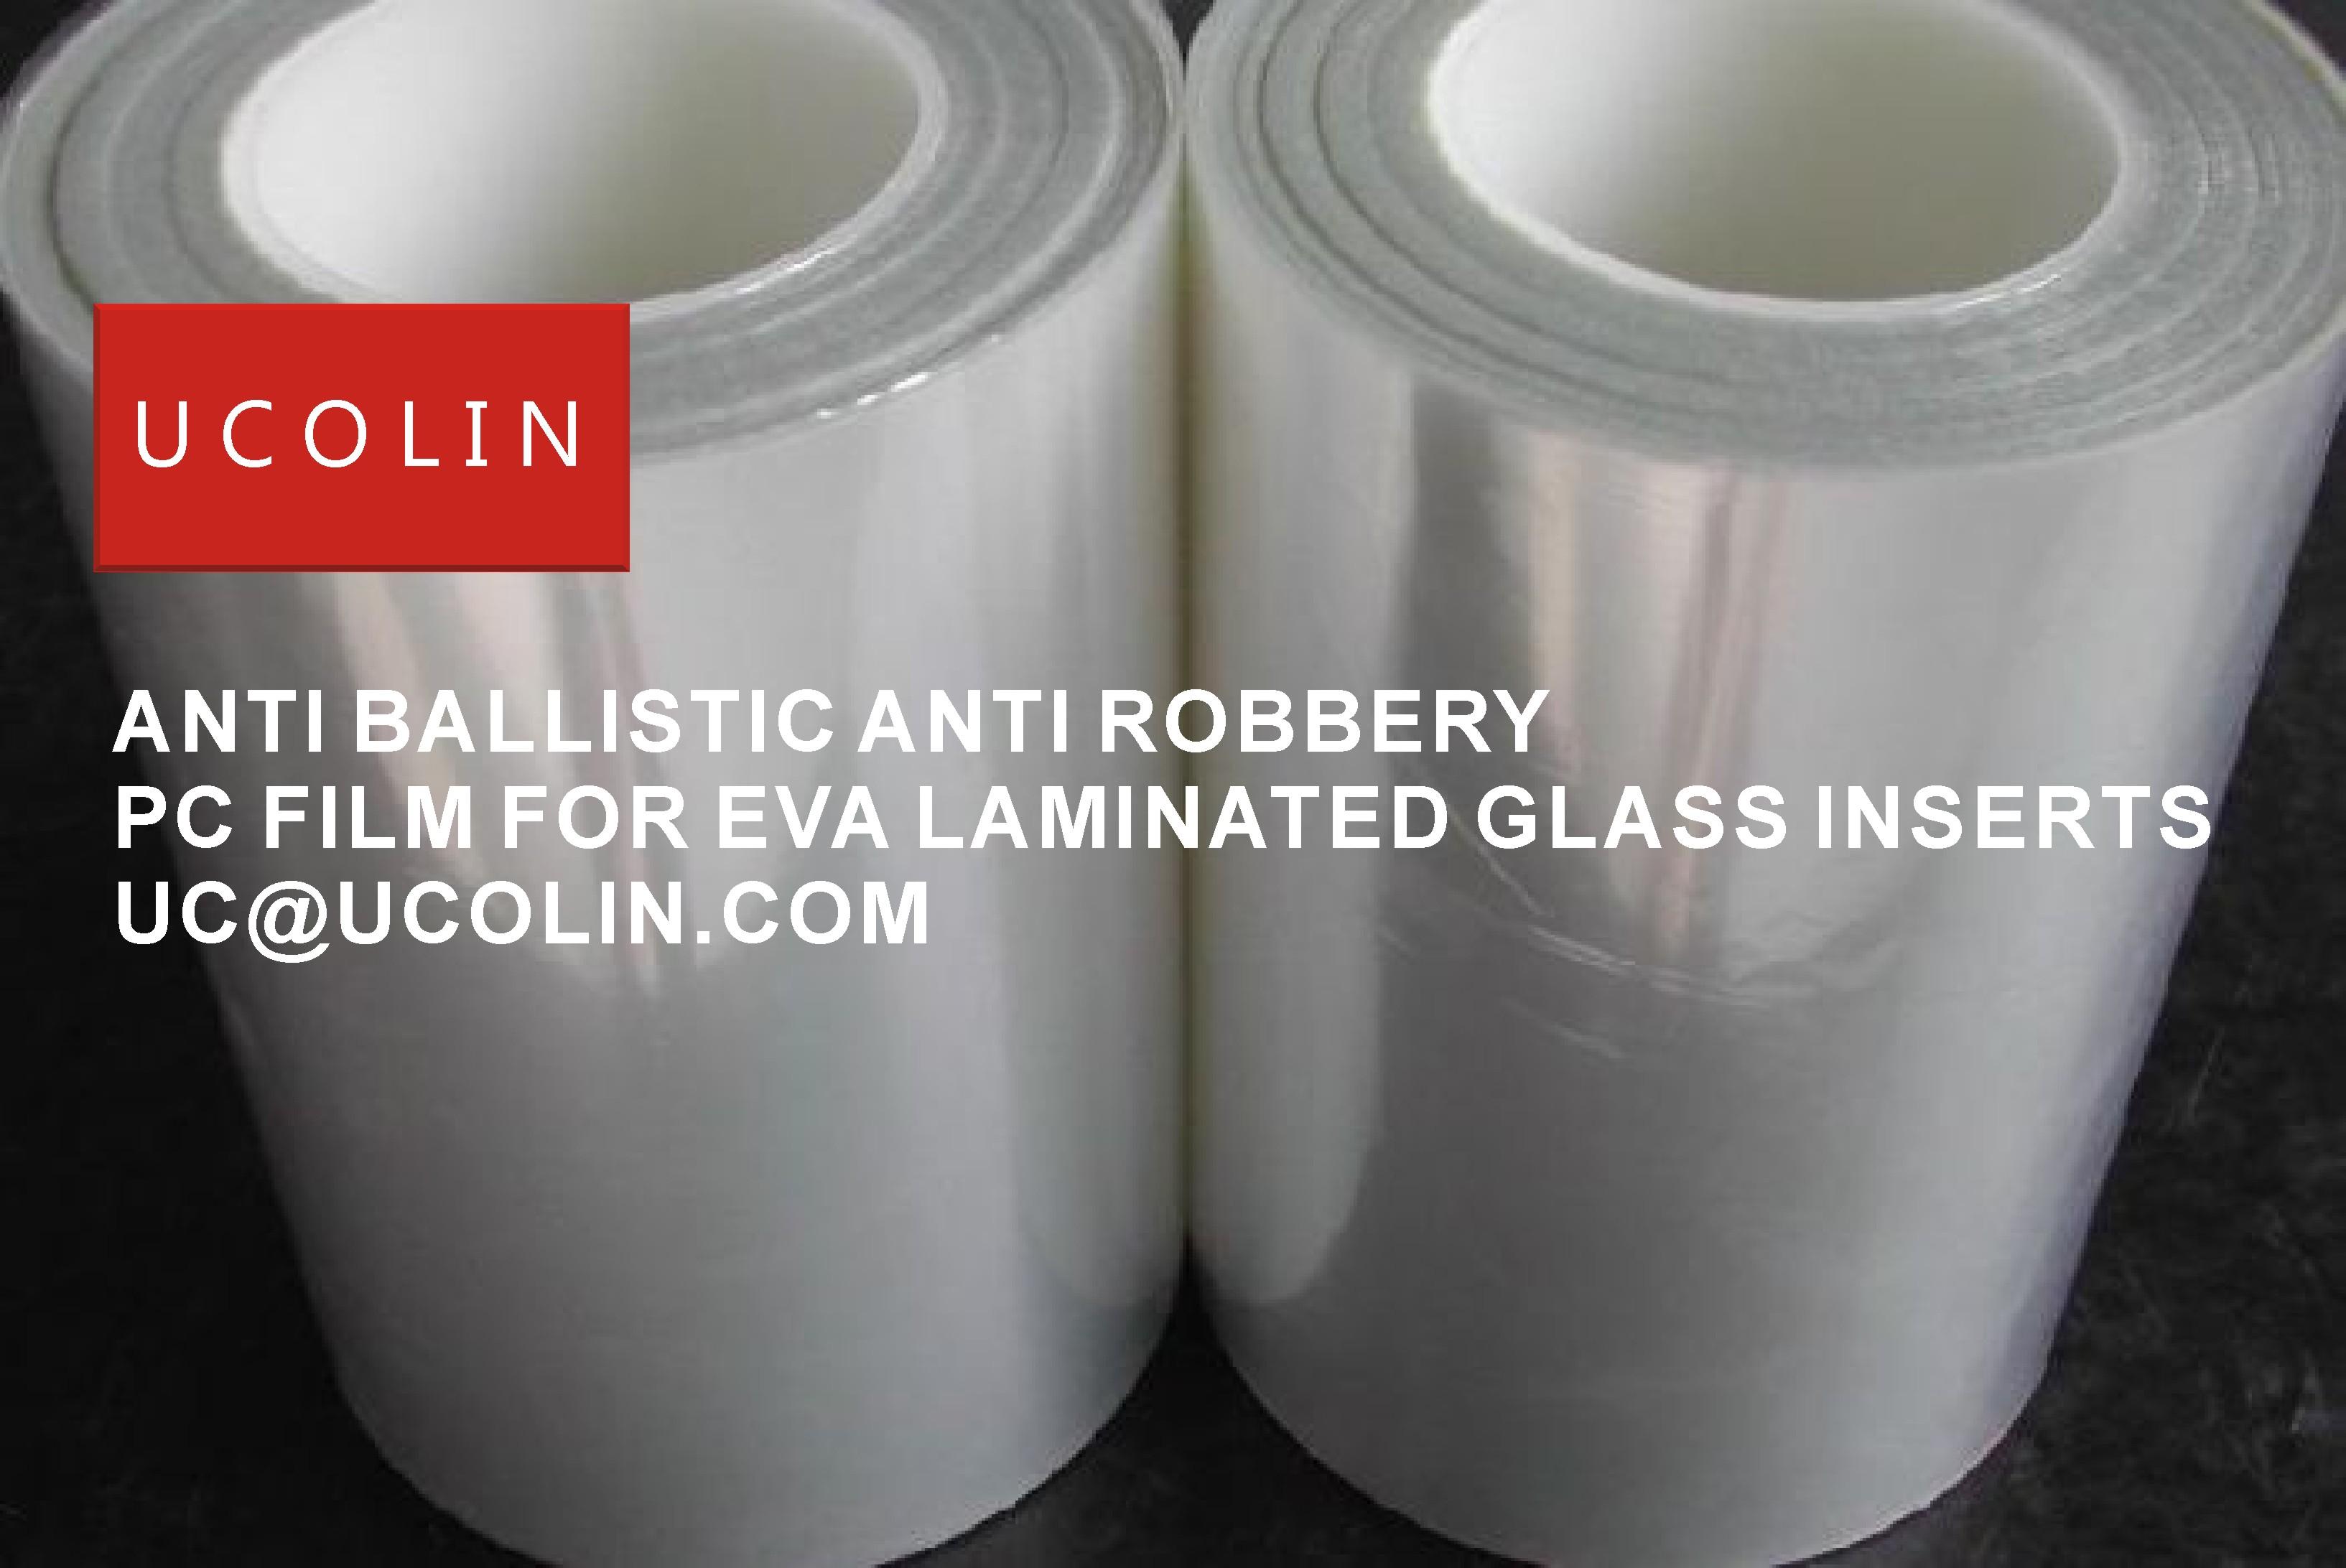 06 ANTI BALLISTIC ANTI ROBBERY PC FILM FOR EVA LAMINATED GLASS INERTS